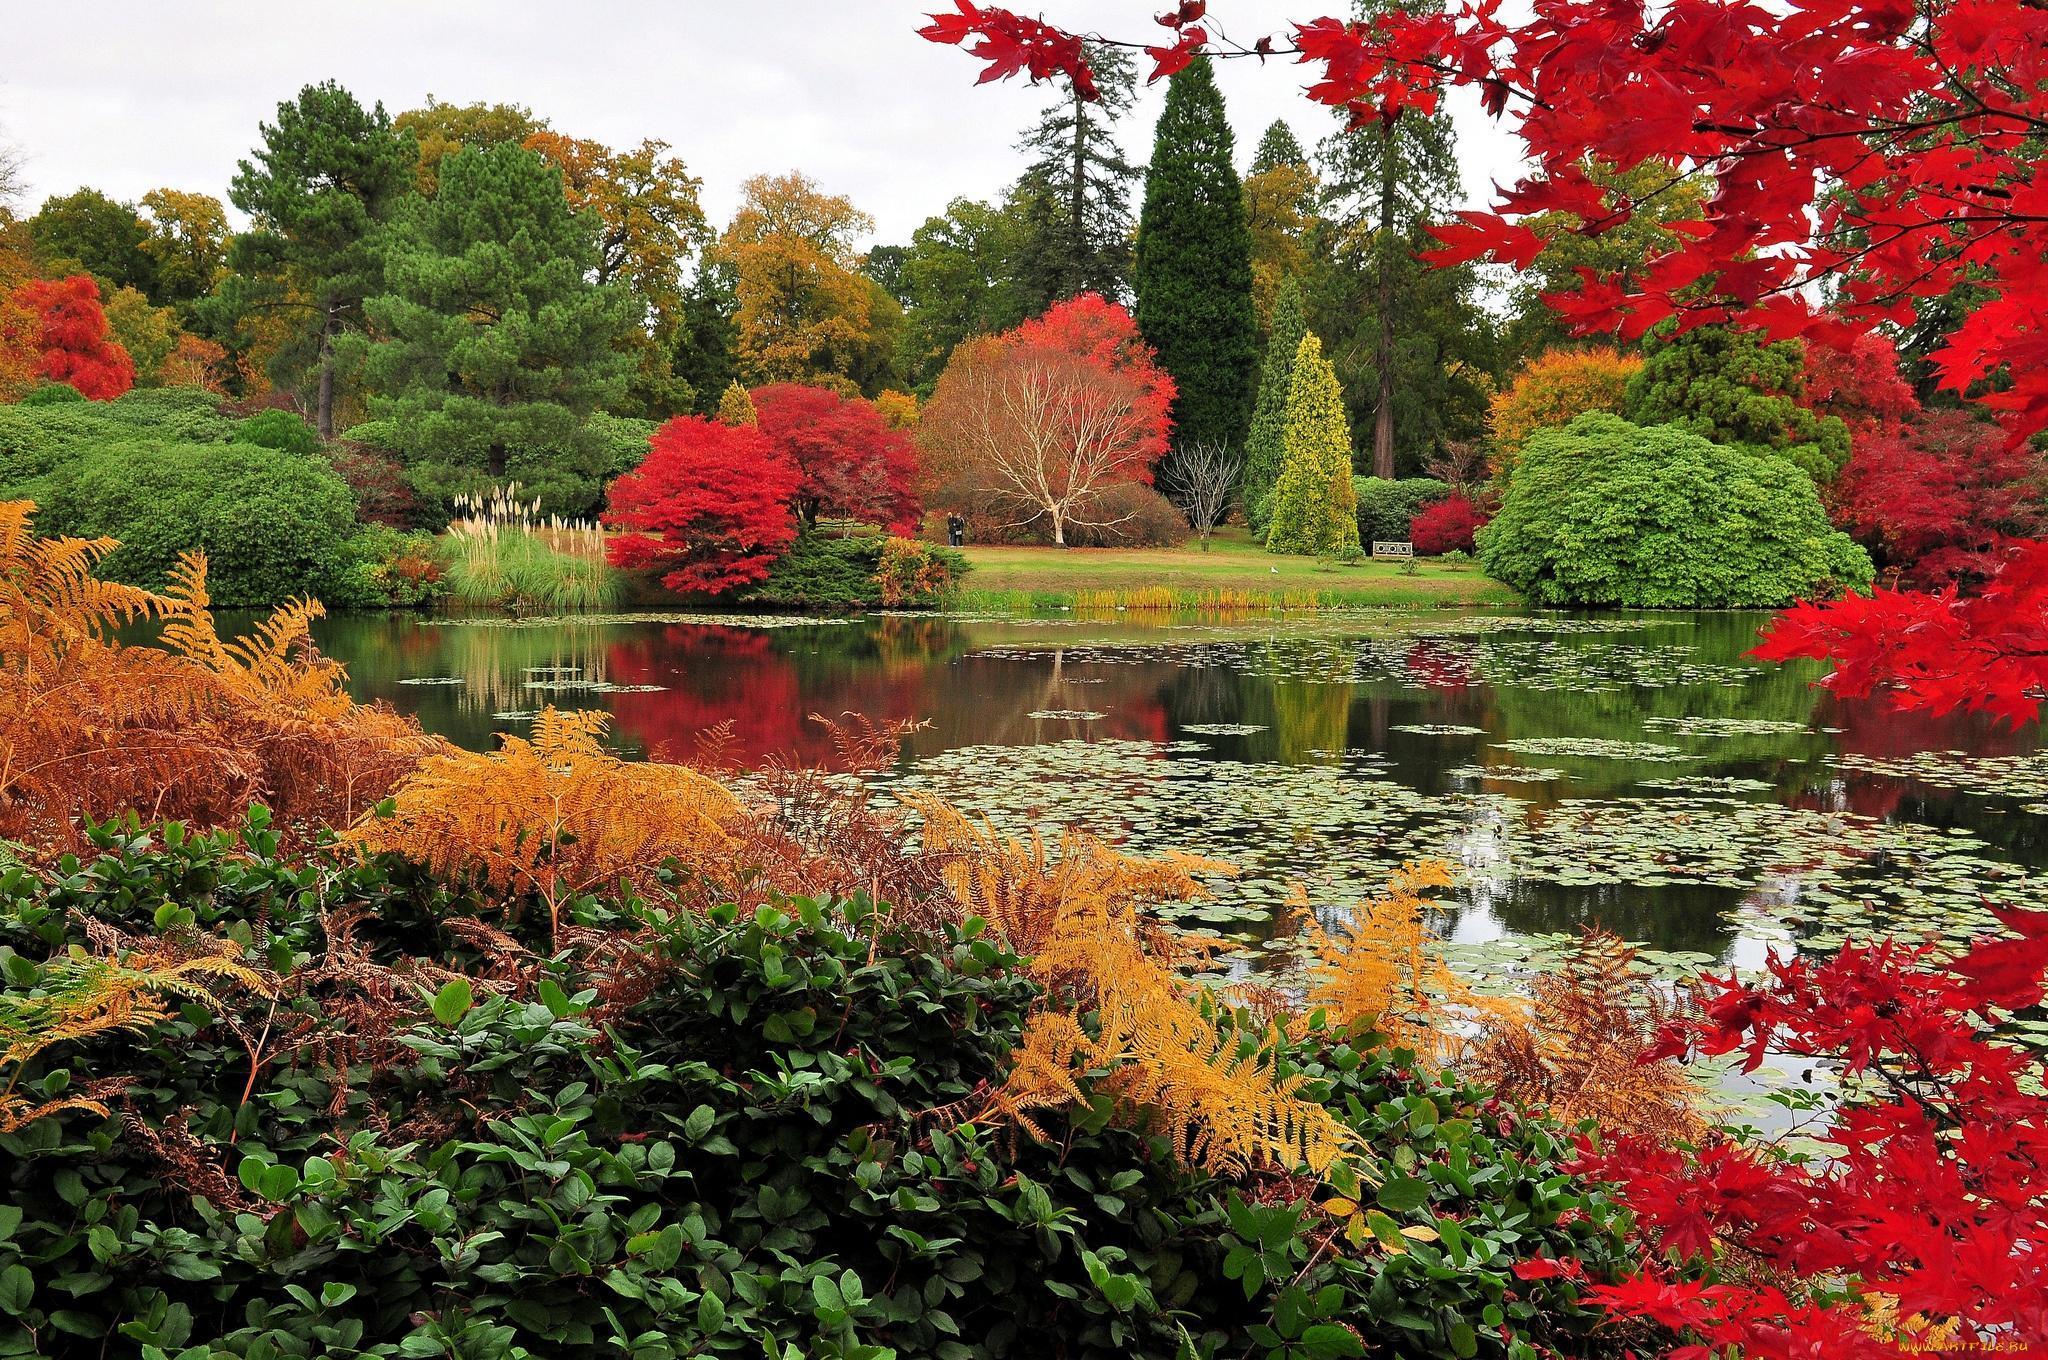 красивый осенний сад фото